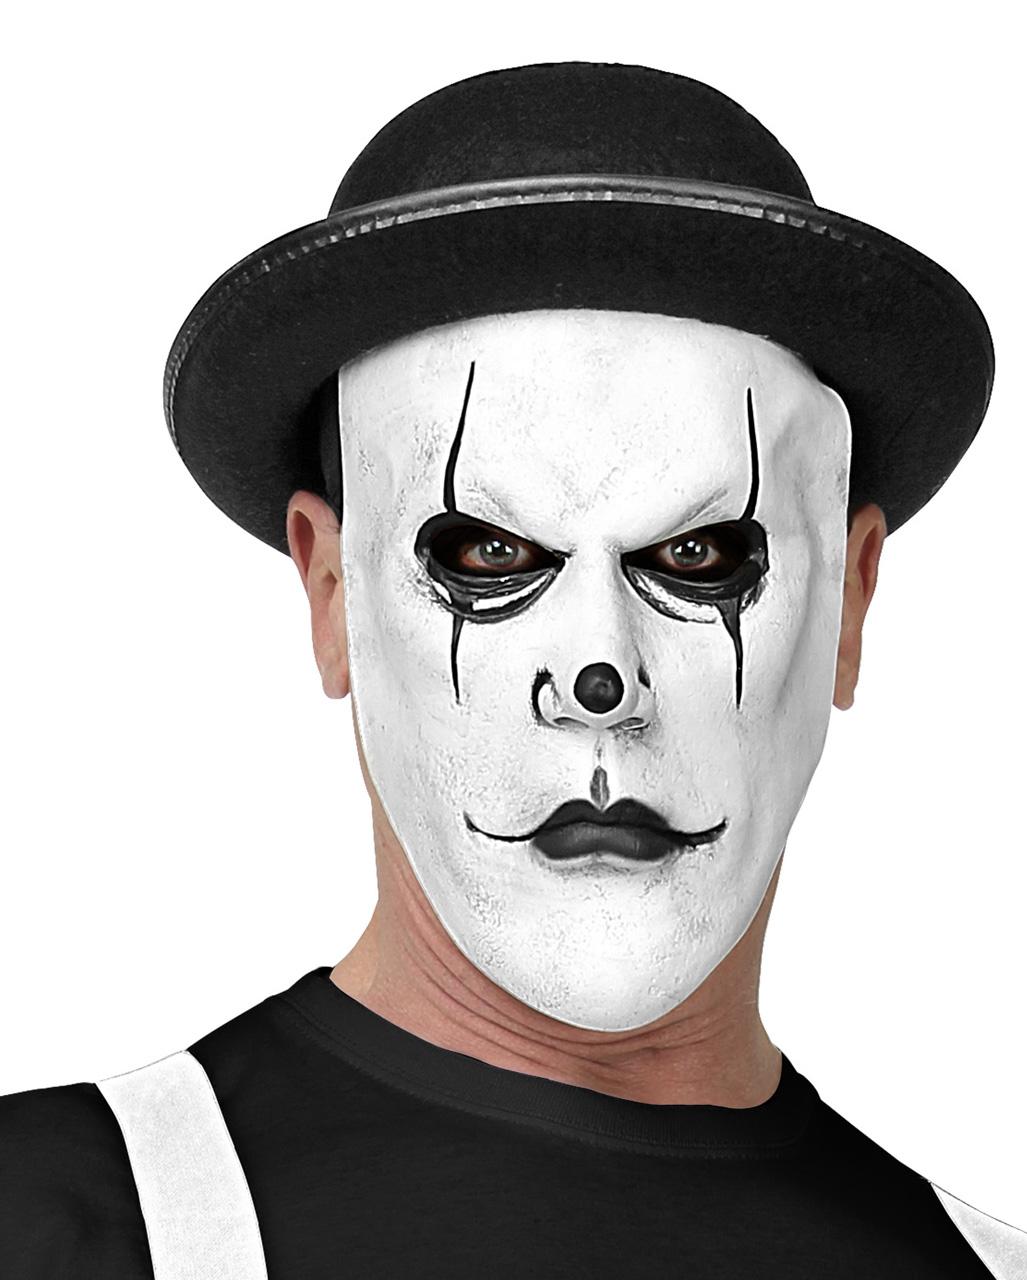 134e1aa2b87 Harlequin Half Mask With Melon buy for Halloween